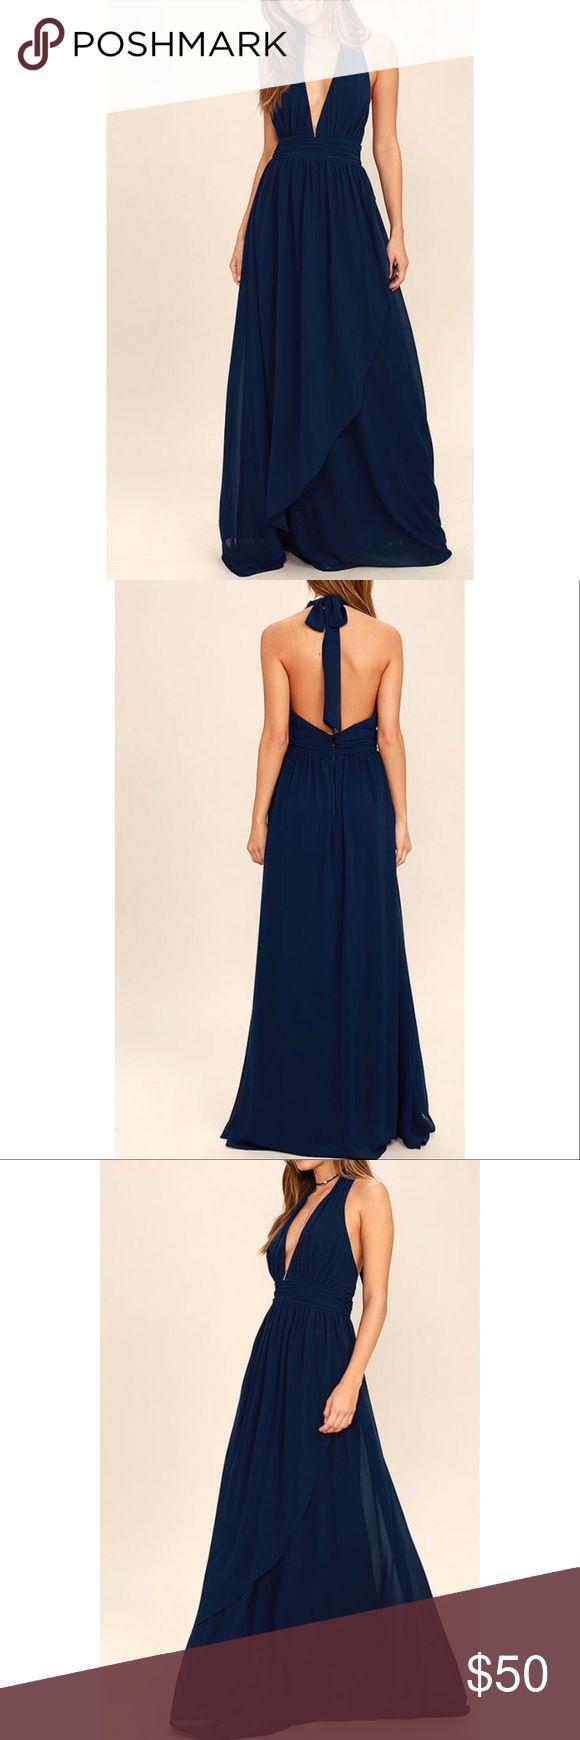 Stop and Stare Navy Blue Halter Maxi Dress deep v neck, halter back. long, formal dress. size extra-small. navy blue. never worn Lulu's Dresses Maxi